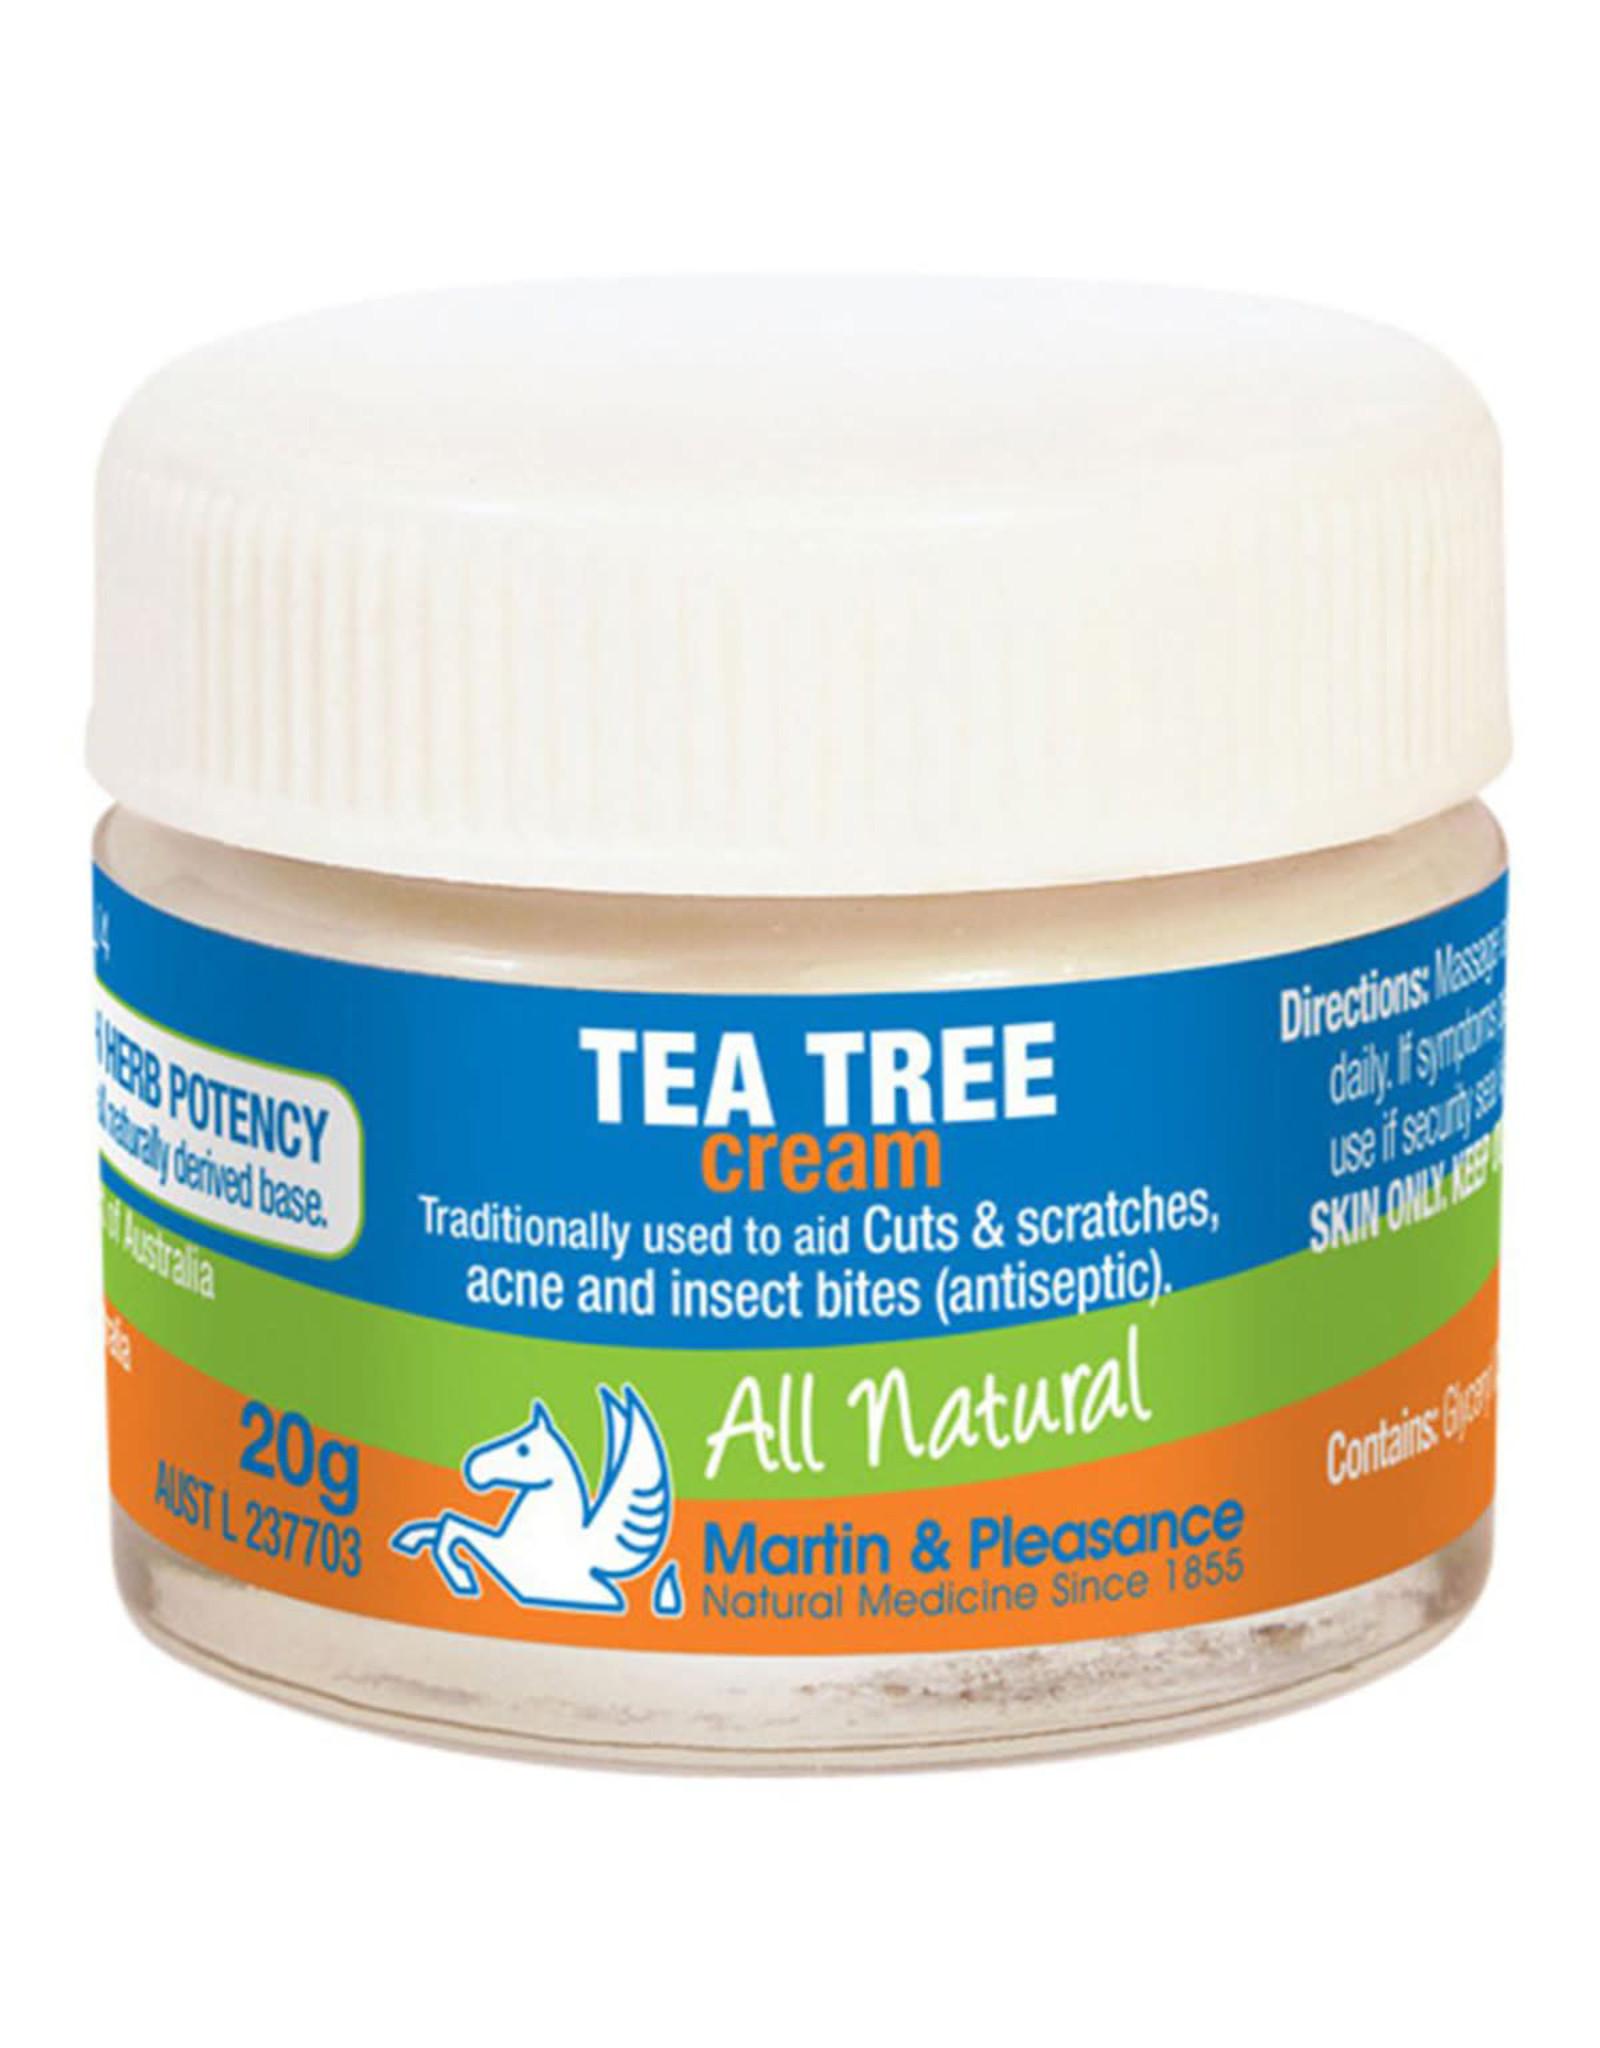 Martin & Pleasance Tea Tree Cream 20g